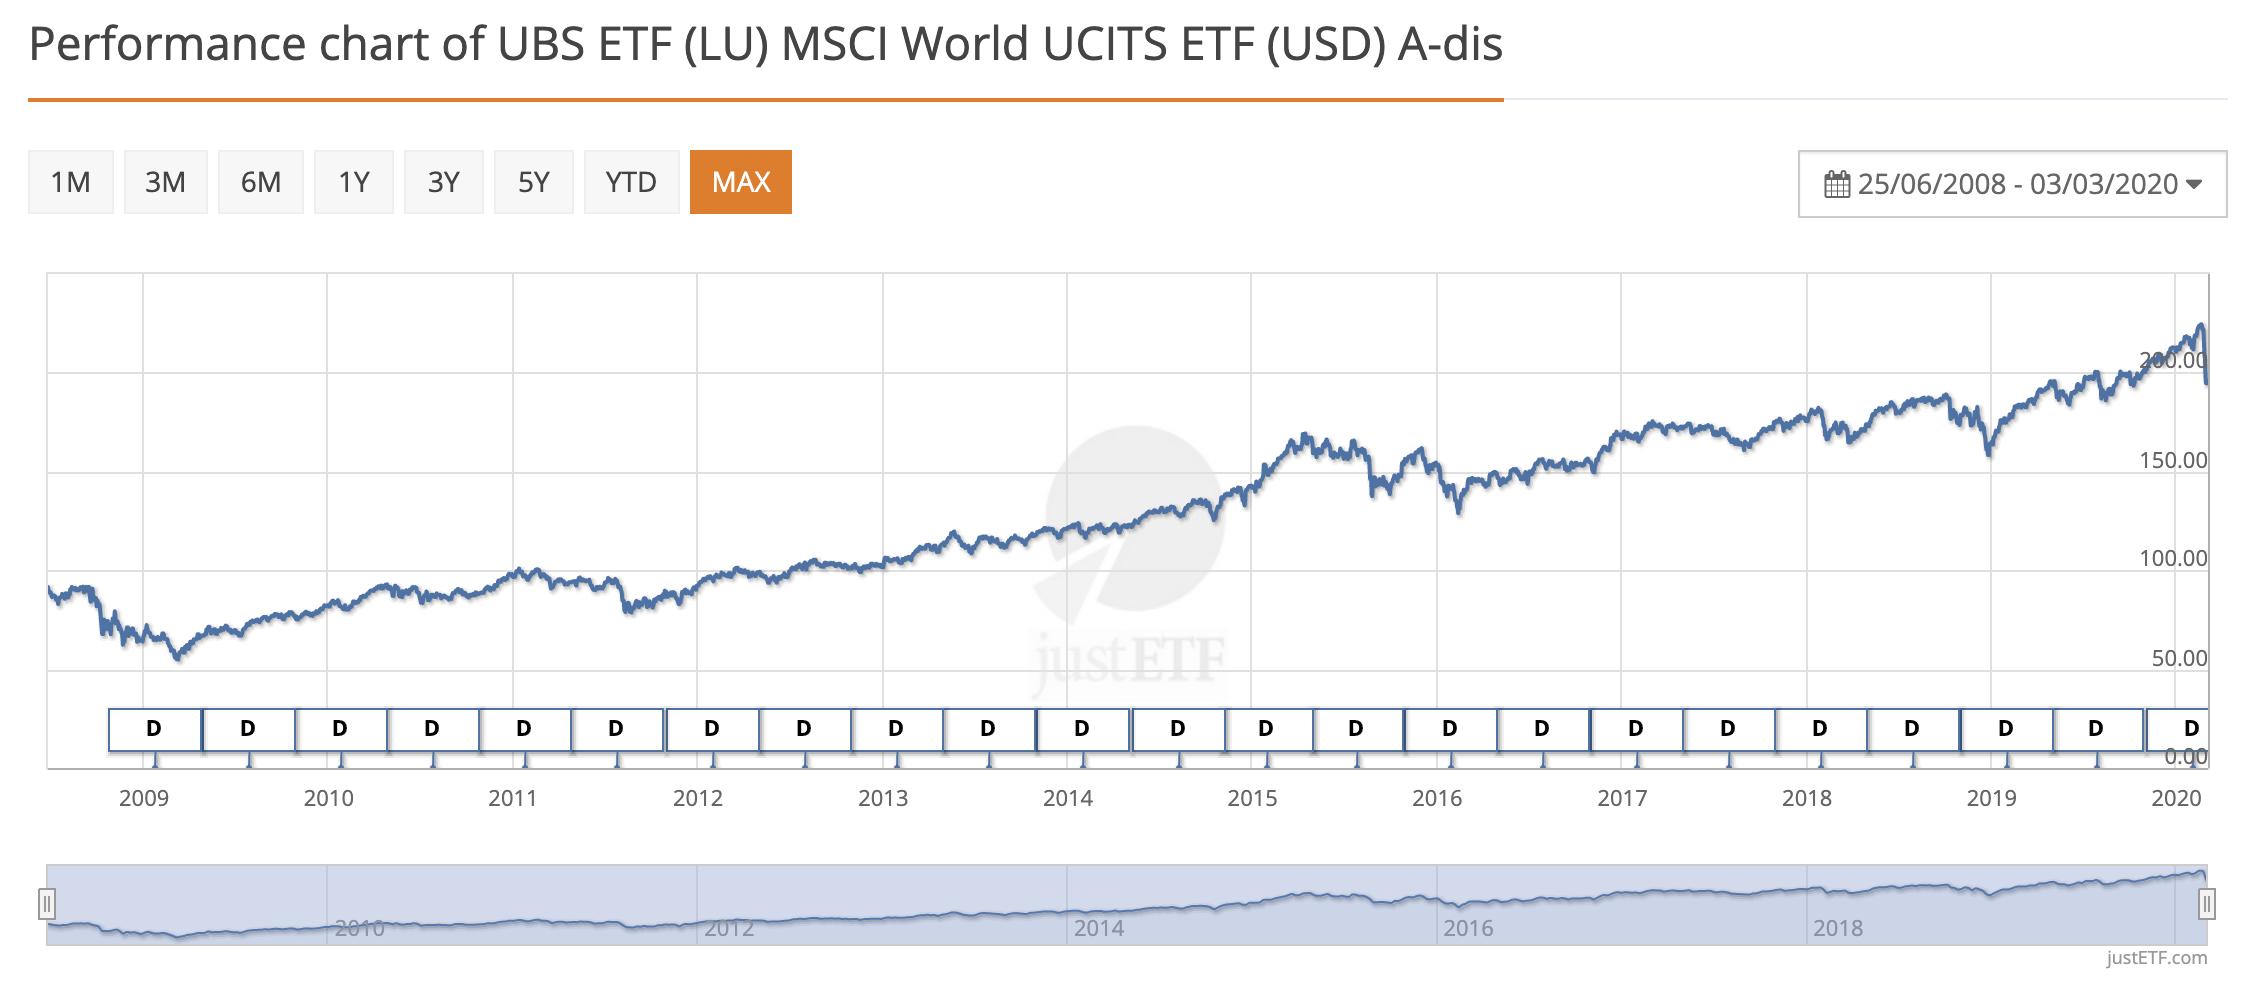 Performance chart of MSCI World UCITS ETF (c) justetf.com